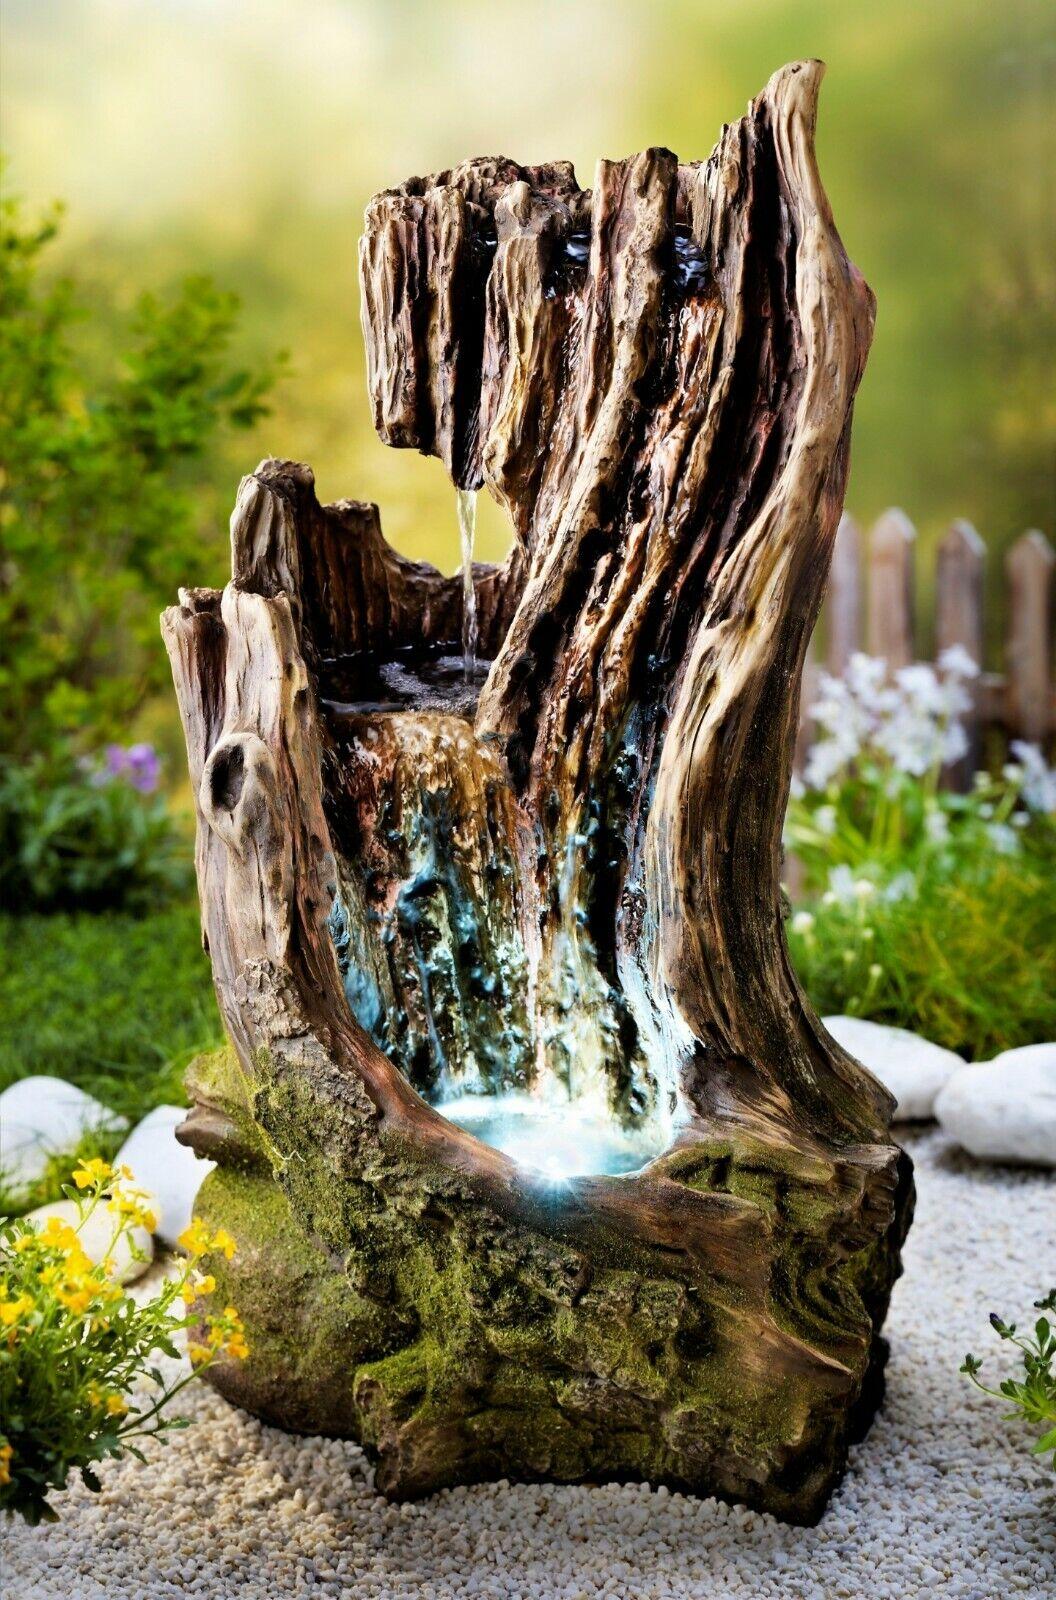 Brunnen Garten Holz Test Vergleich Brunnen Garten Holz Günstig